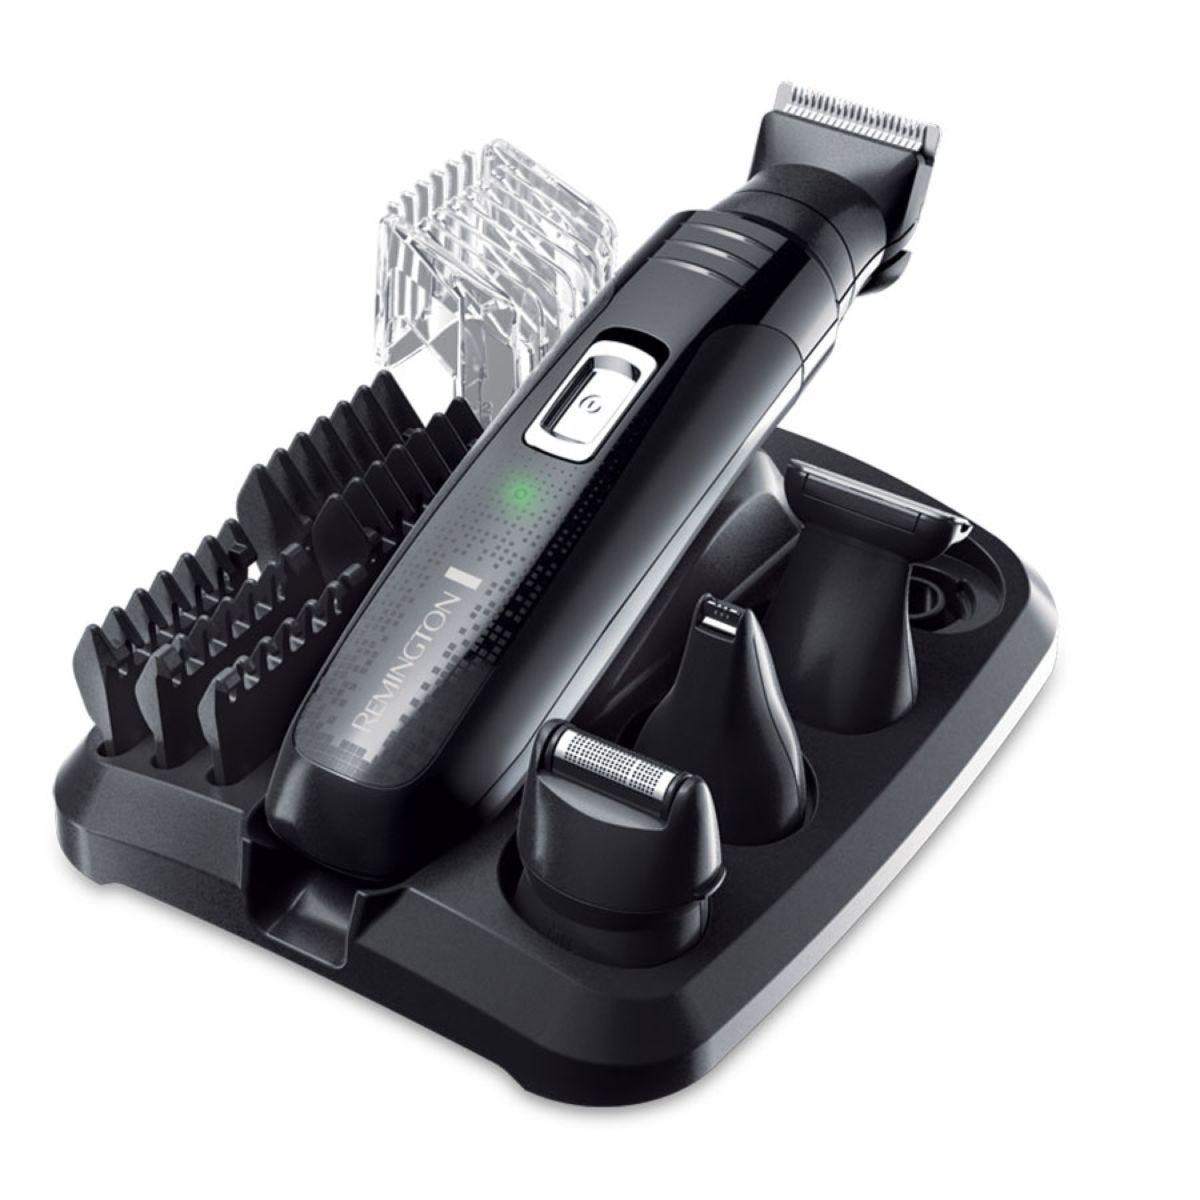 Remington PG6130 Multi-Groom Kit - Black